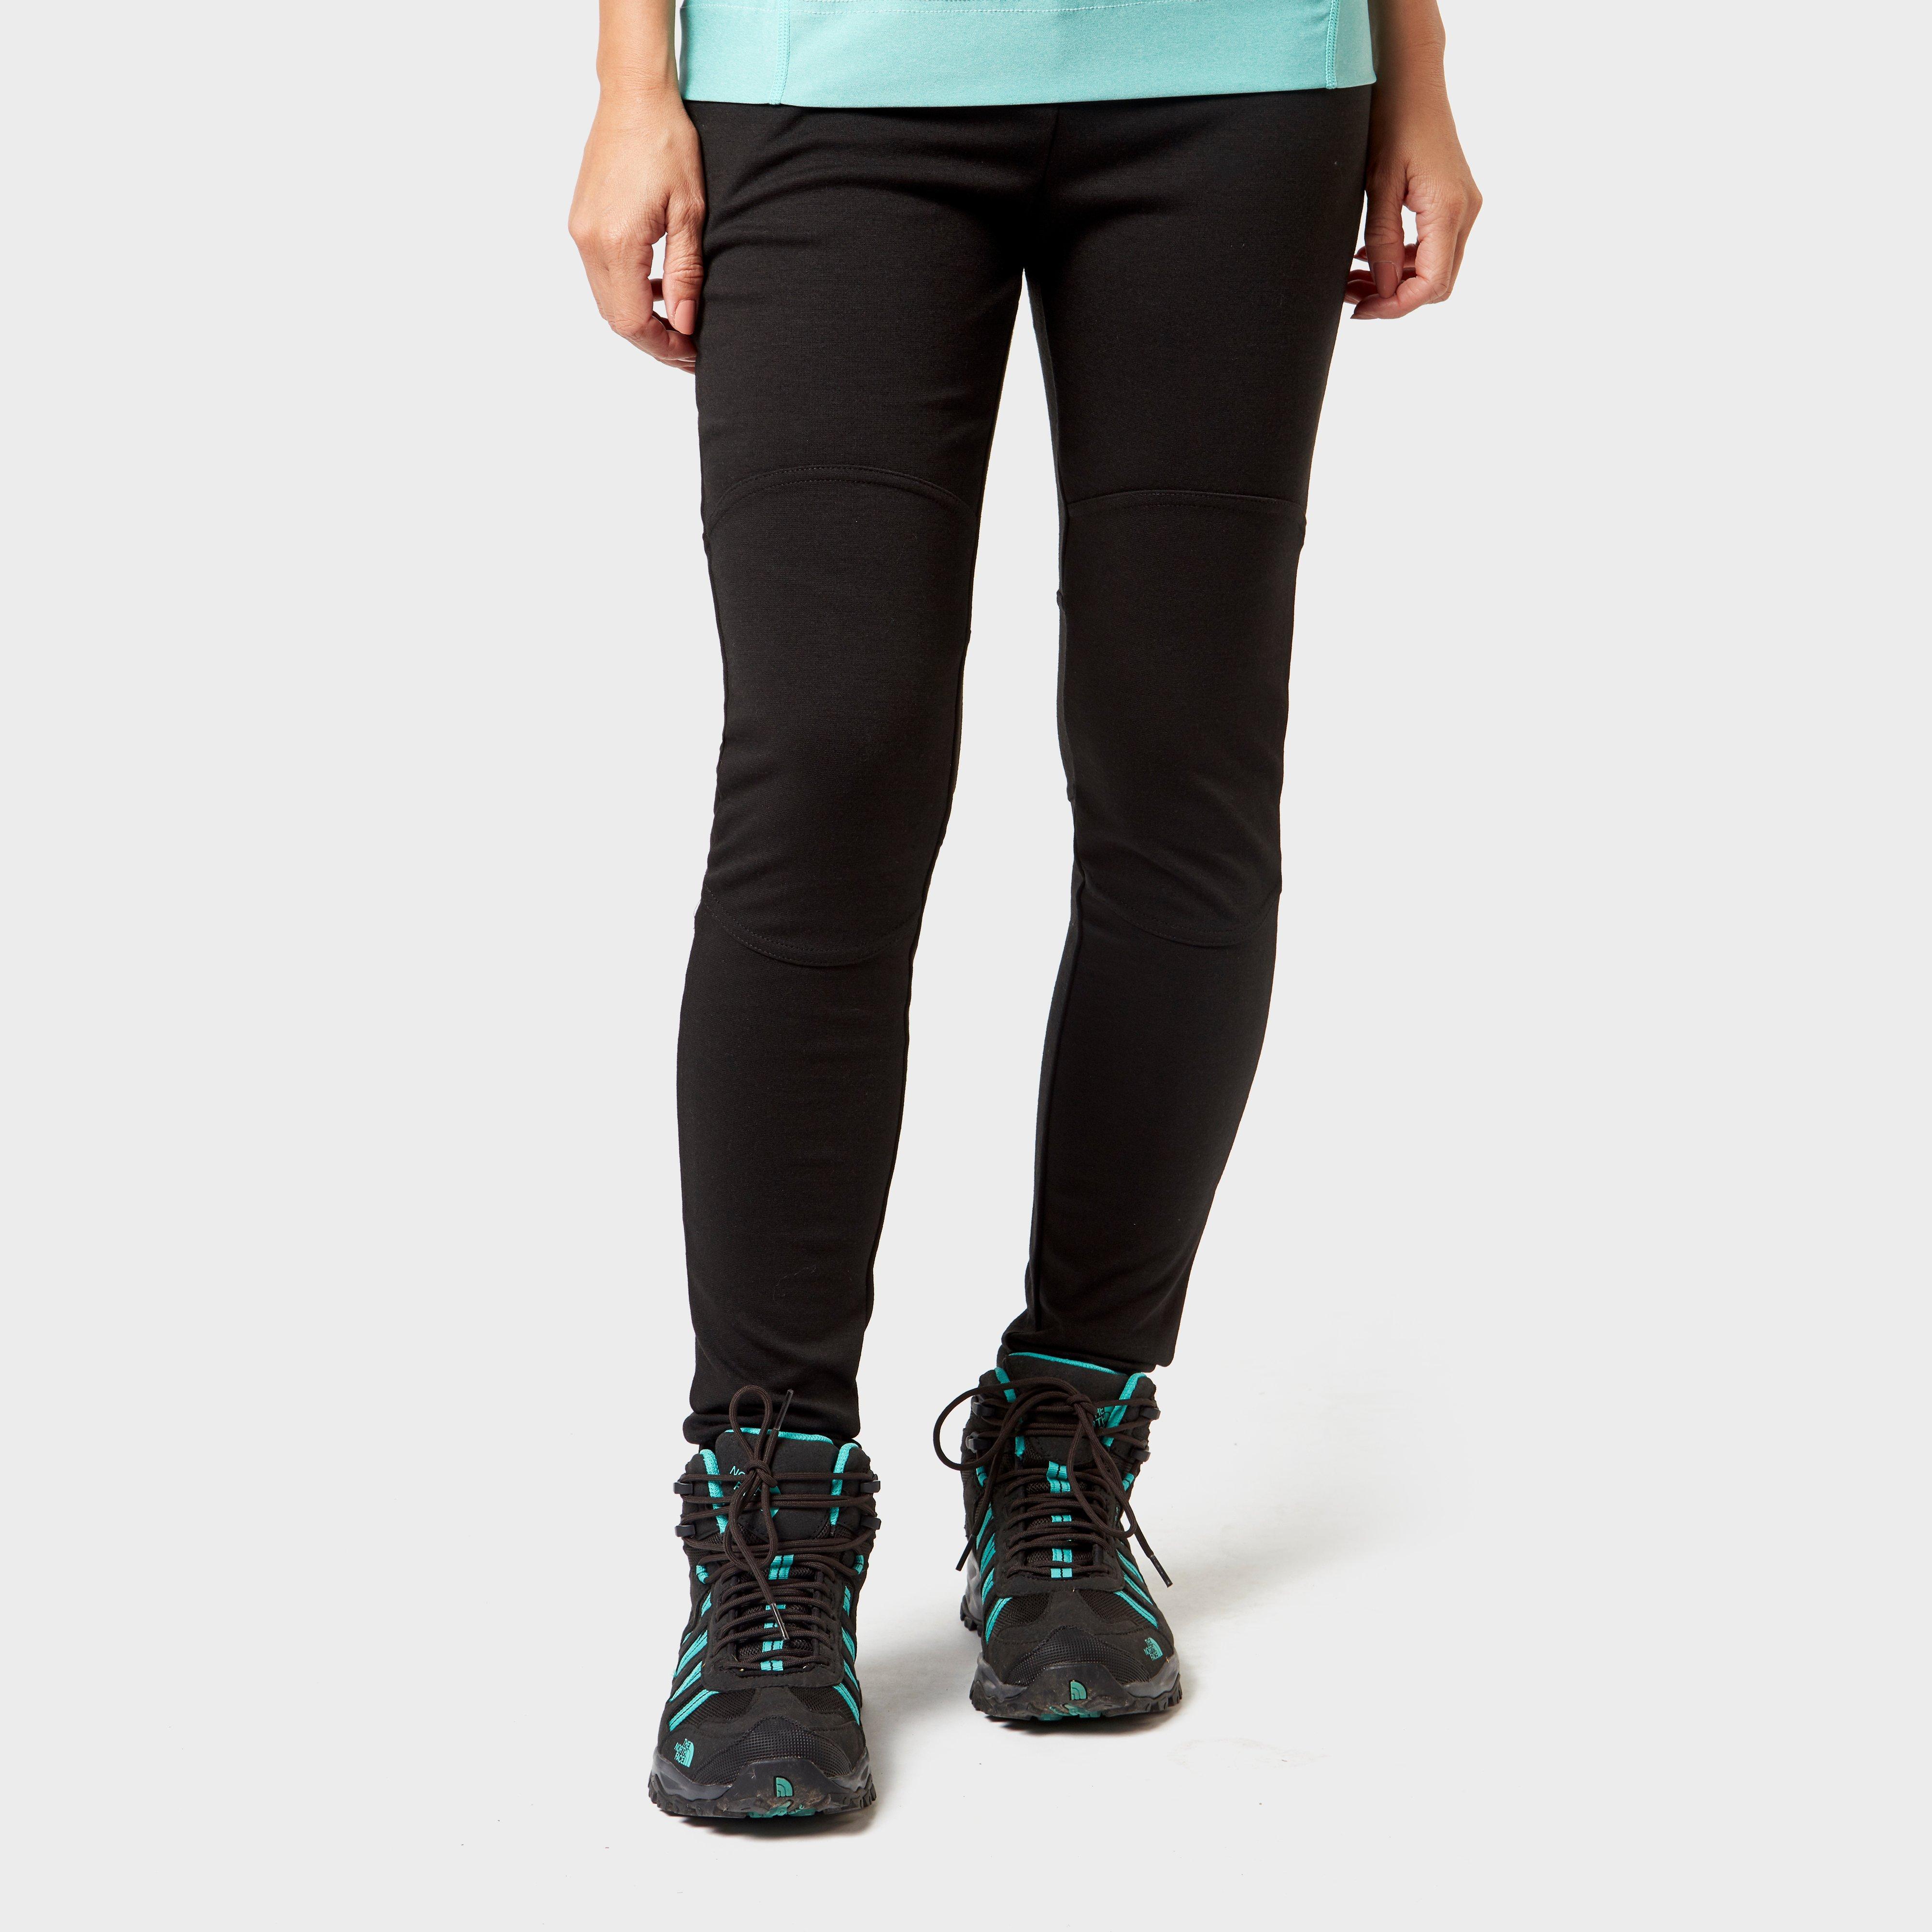 Peter Storm Women's Walking Leggings